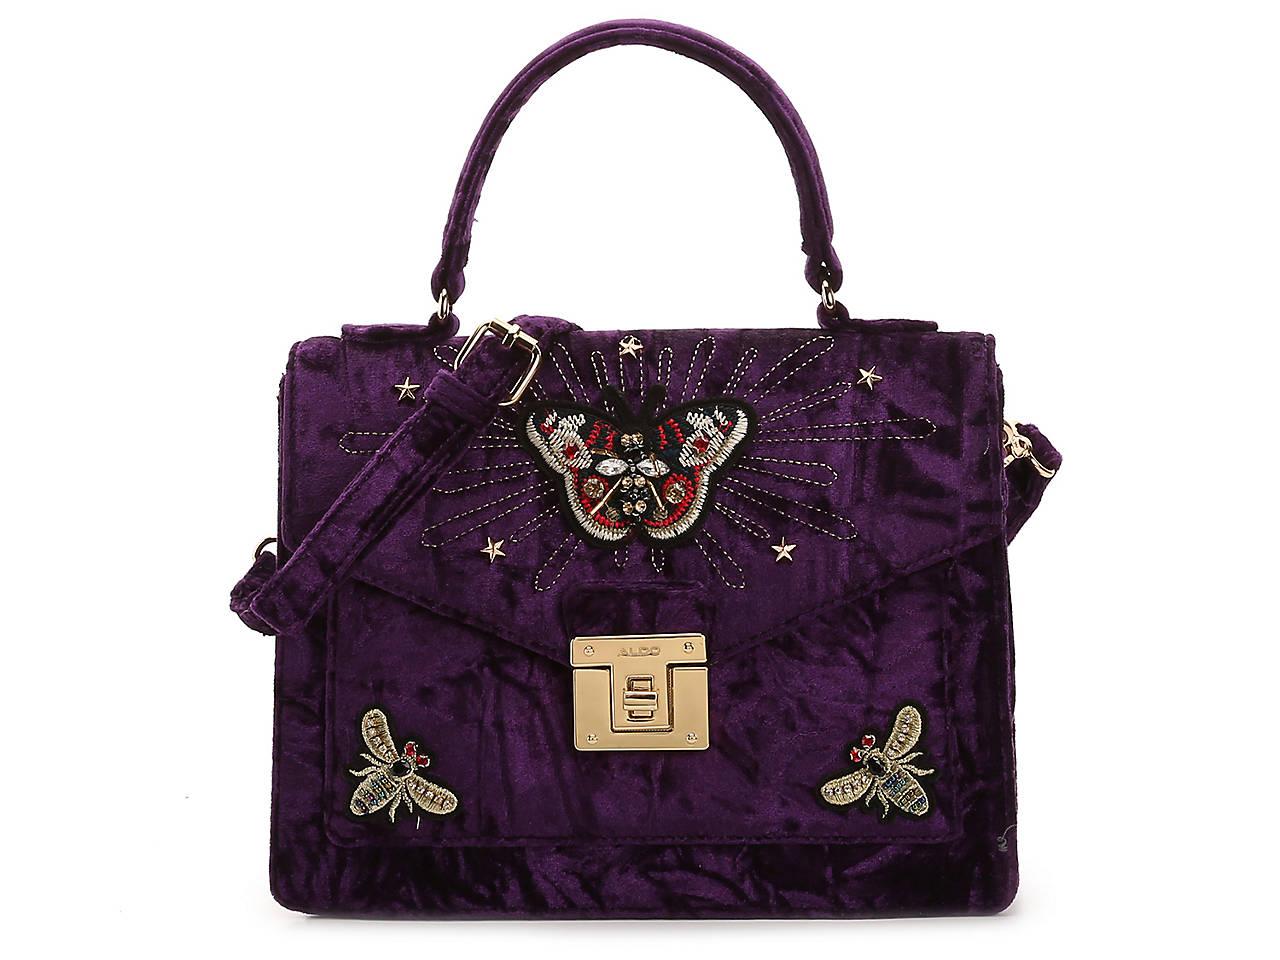 50a708baa03 Aldo Durosty Velvet Satchel Women s Handbags   Accessories